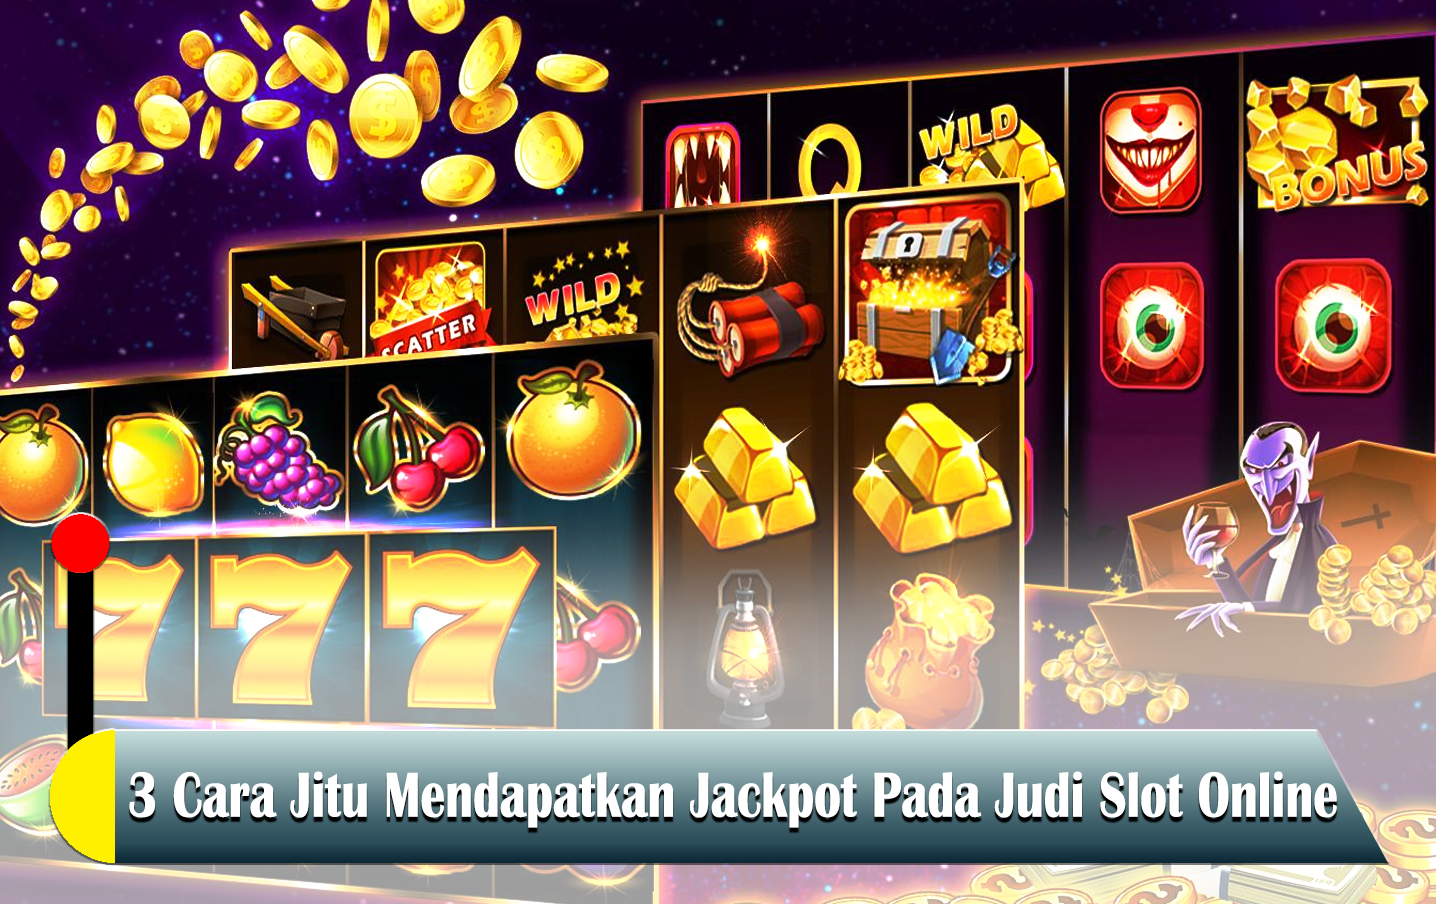 3 Cara Jitu Mendapatkan Jackpot Pada Judi Slot Online